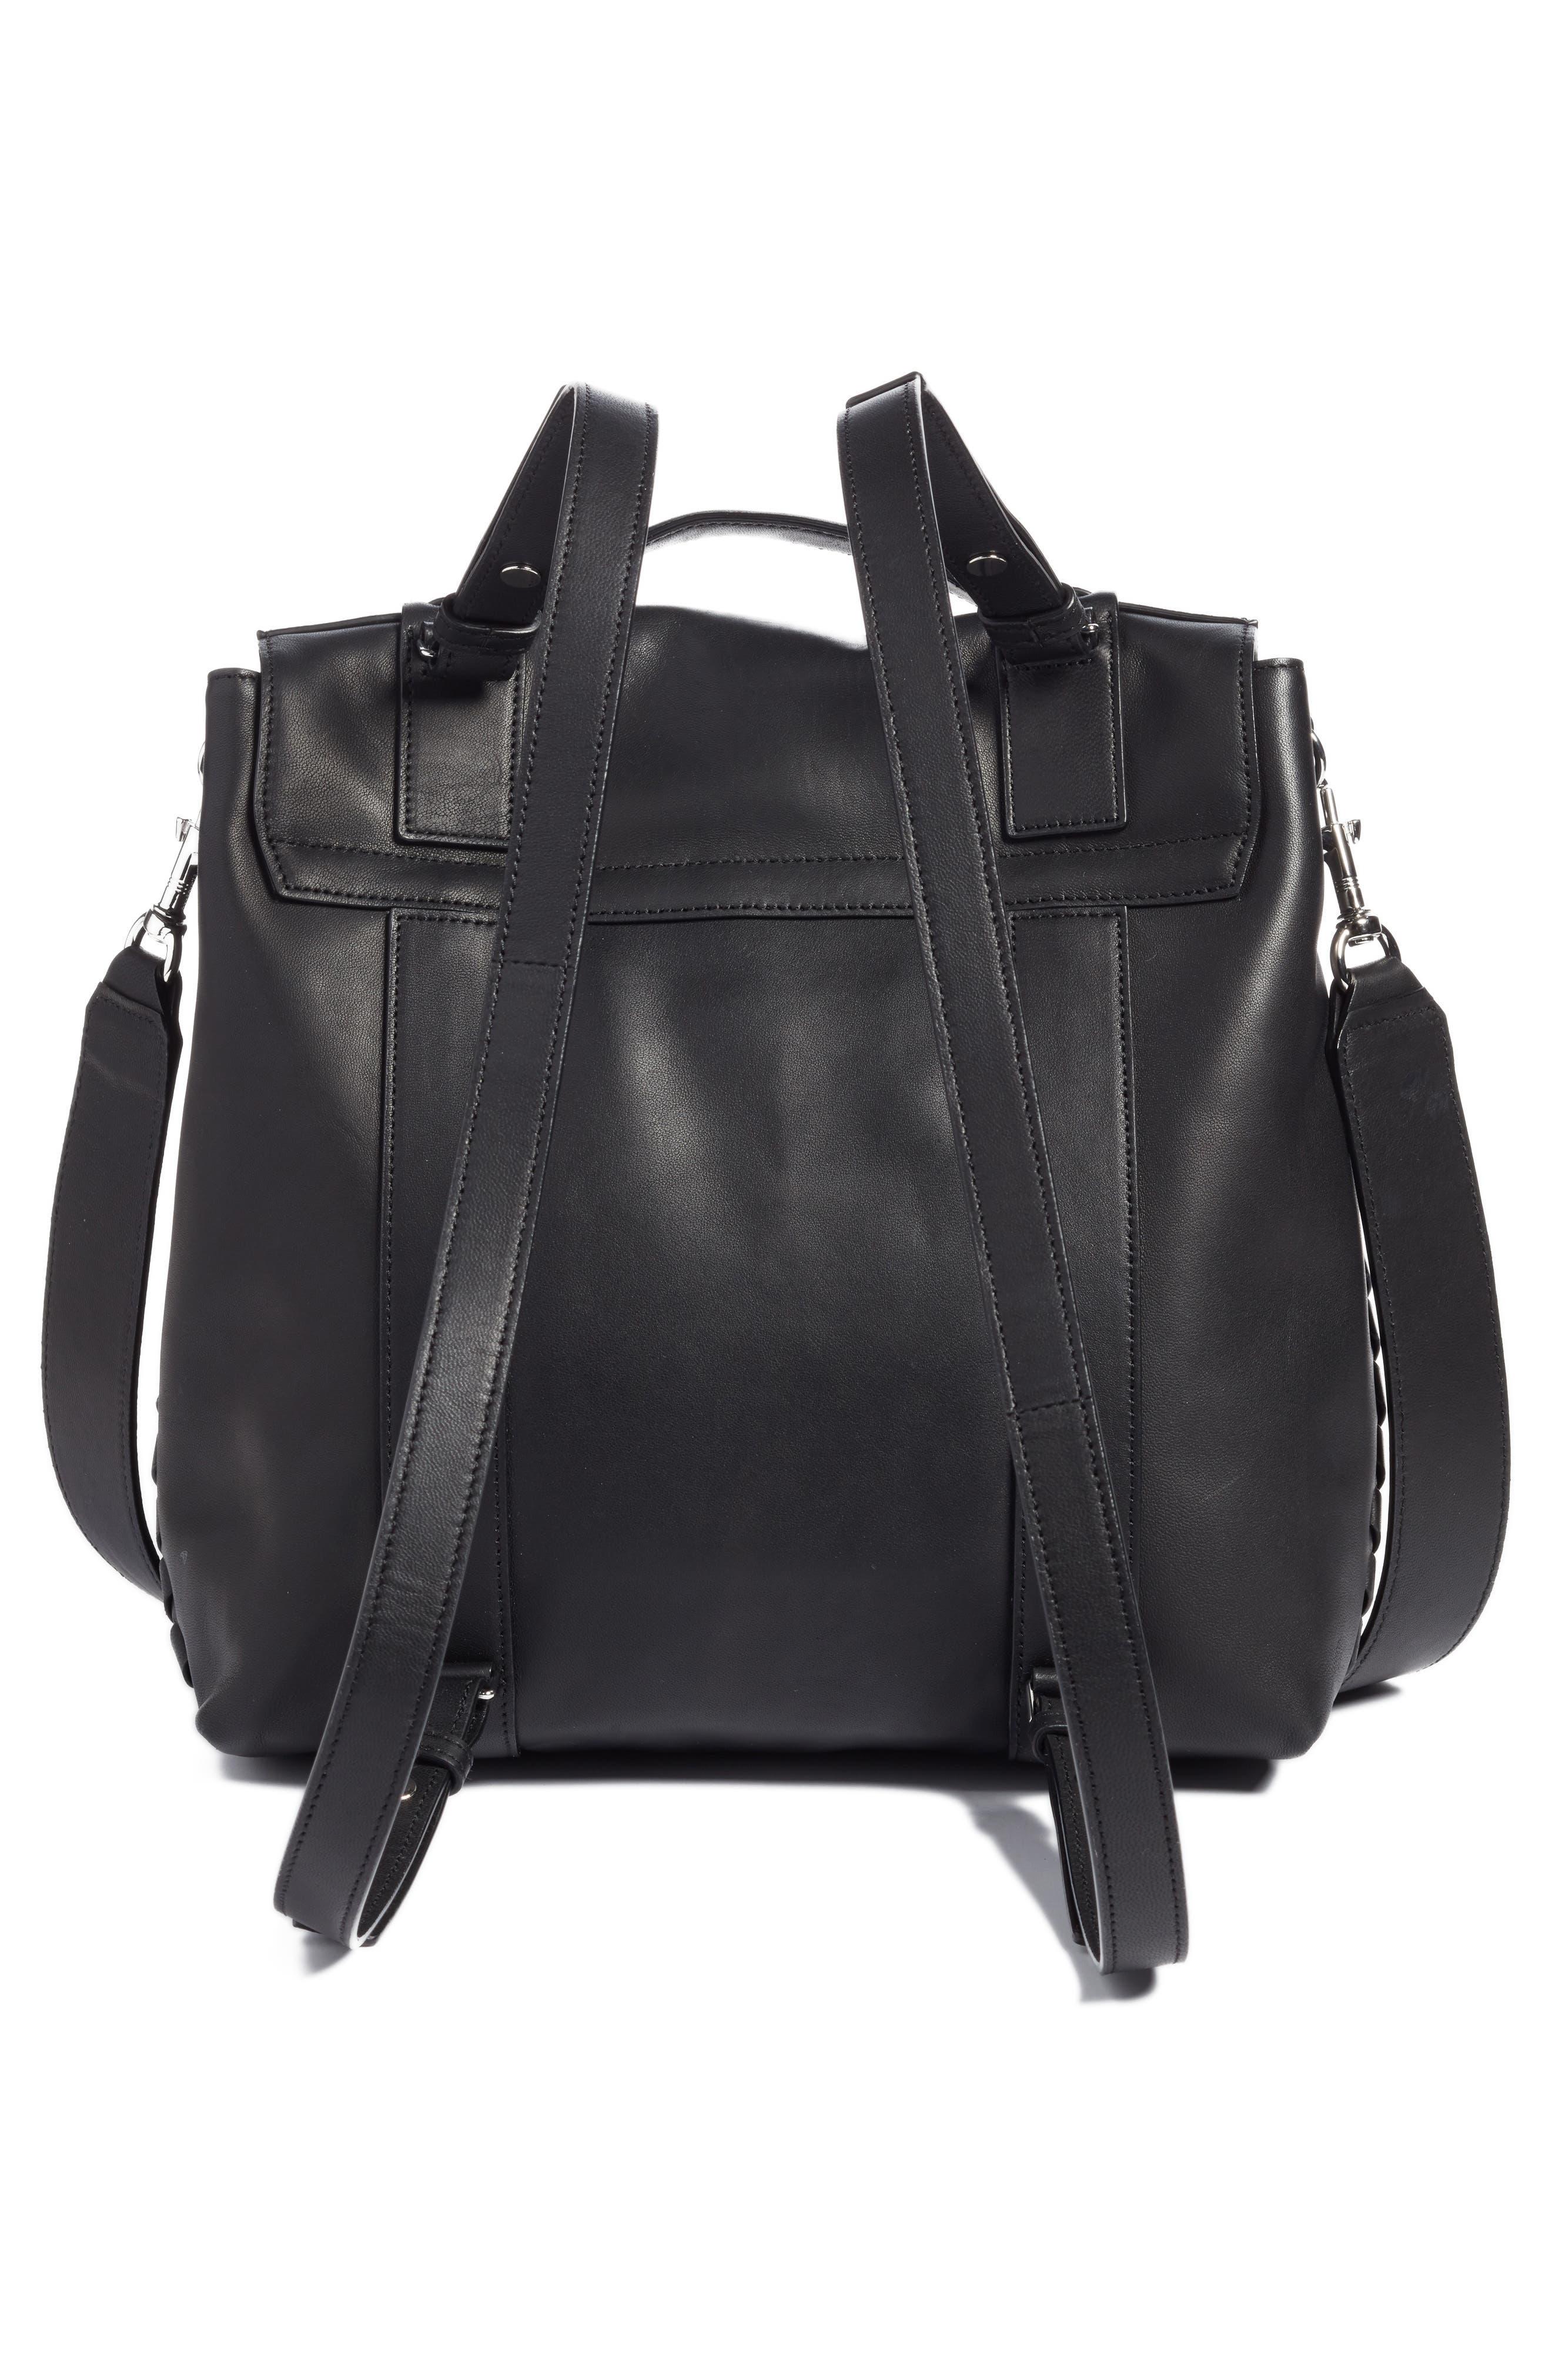 ALLSAINTS, Fin Leather Backpack, Alternate thumbnail 3, color, BLACK